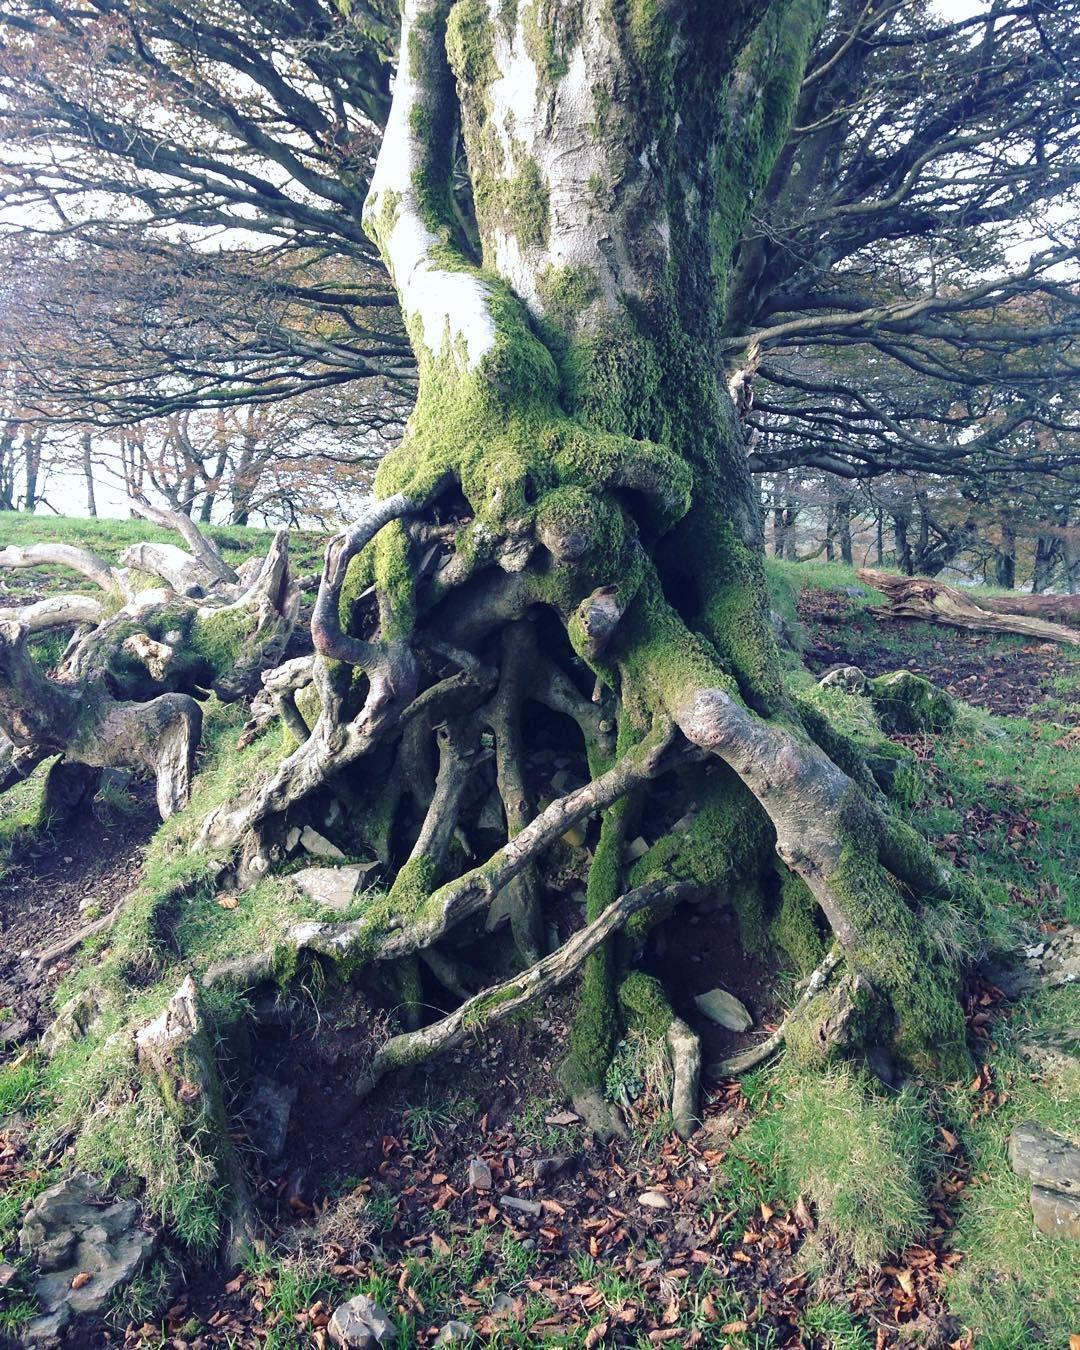 Trees hugging